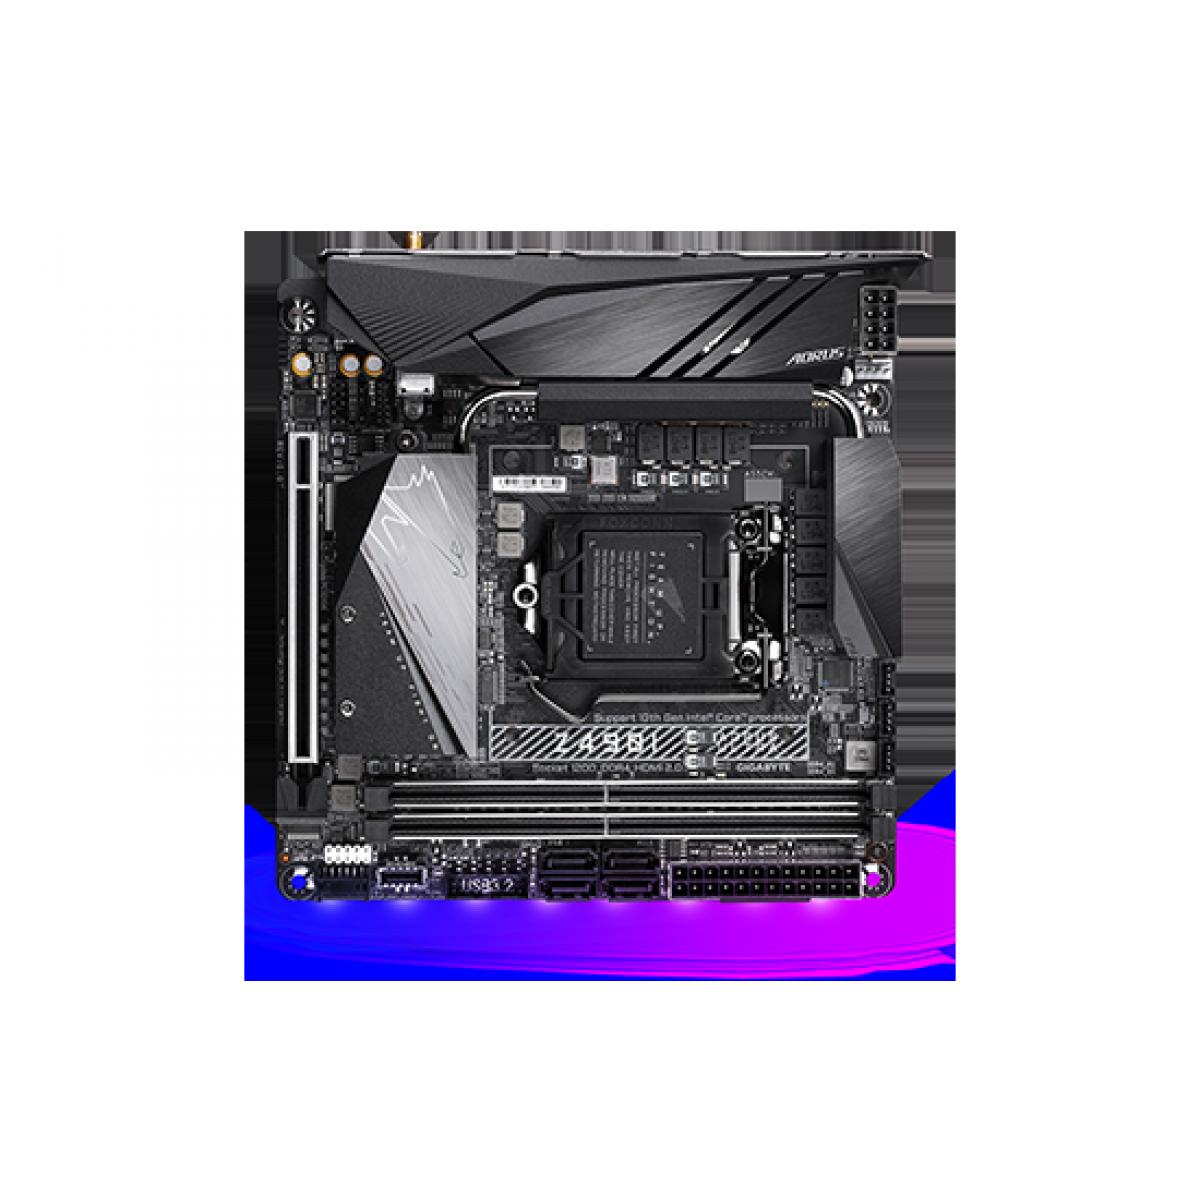 Placa Mãe Gigabyte Z49I Aorus Ultra, Chipset Z490, Intel LGA 1200, Wi-Fi, Mini-ITX, DDR4 - Open Box